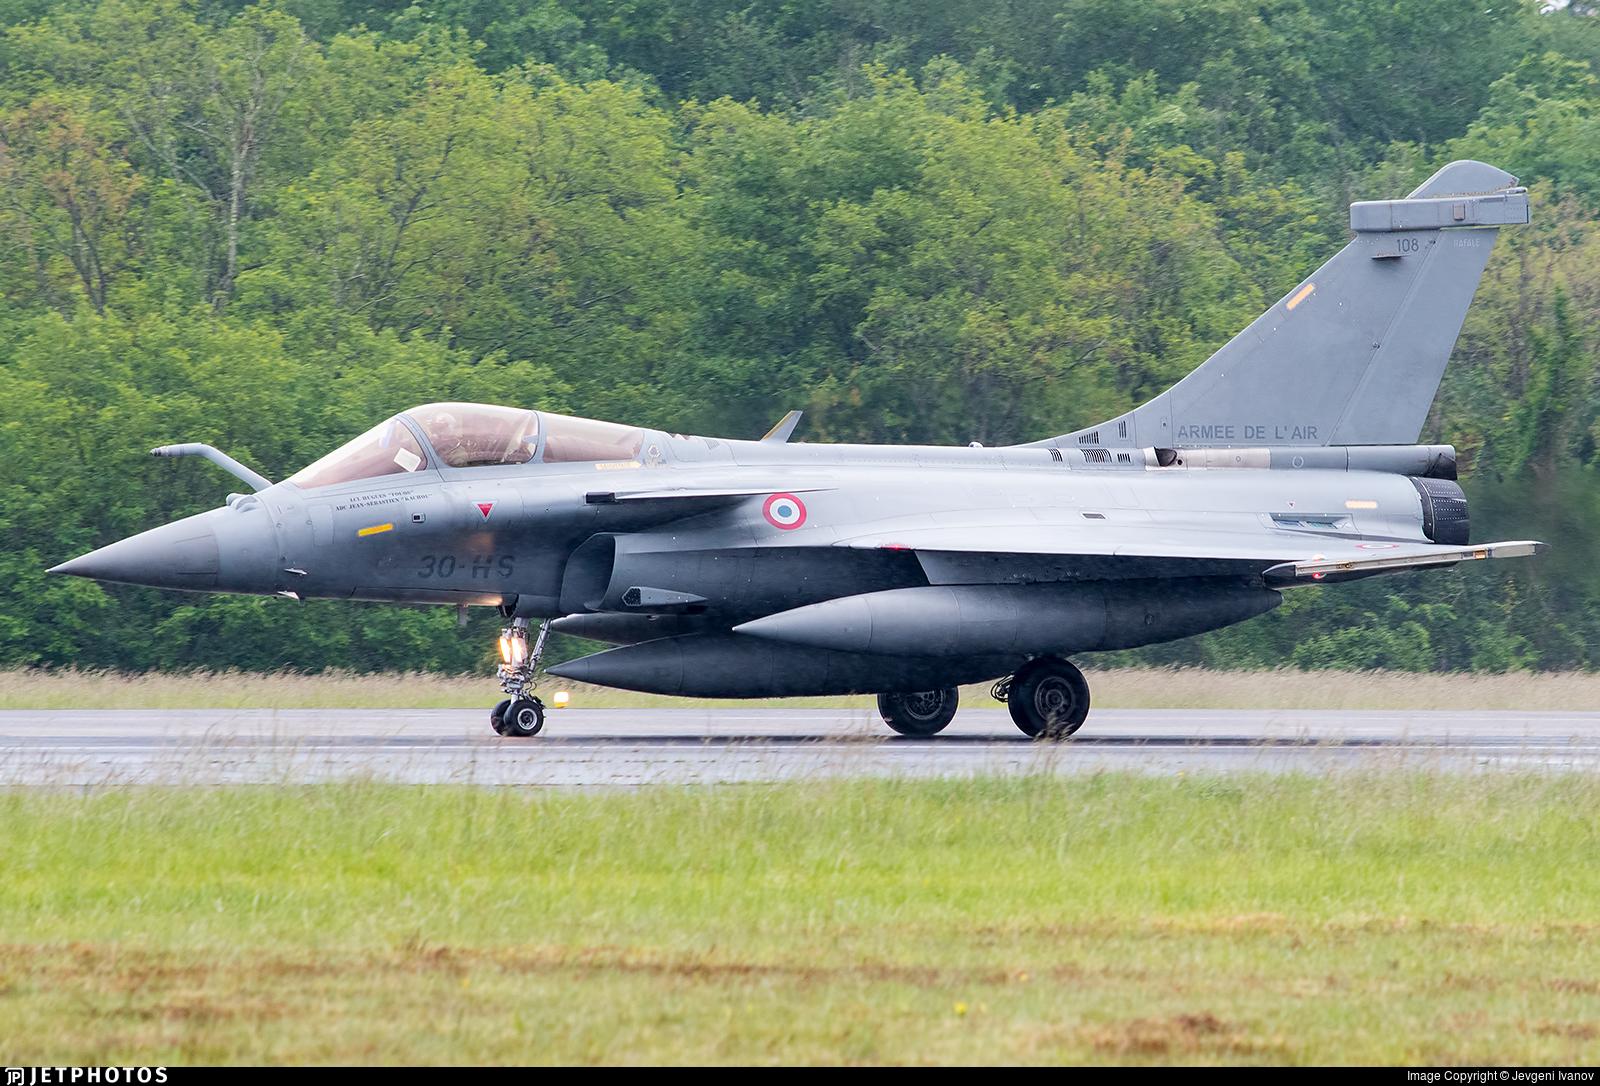 108 - Dassault Rafale C - France - Air Force